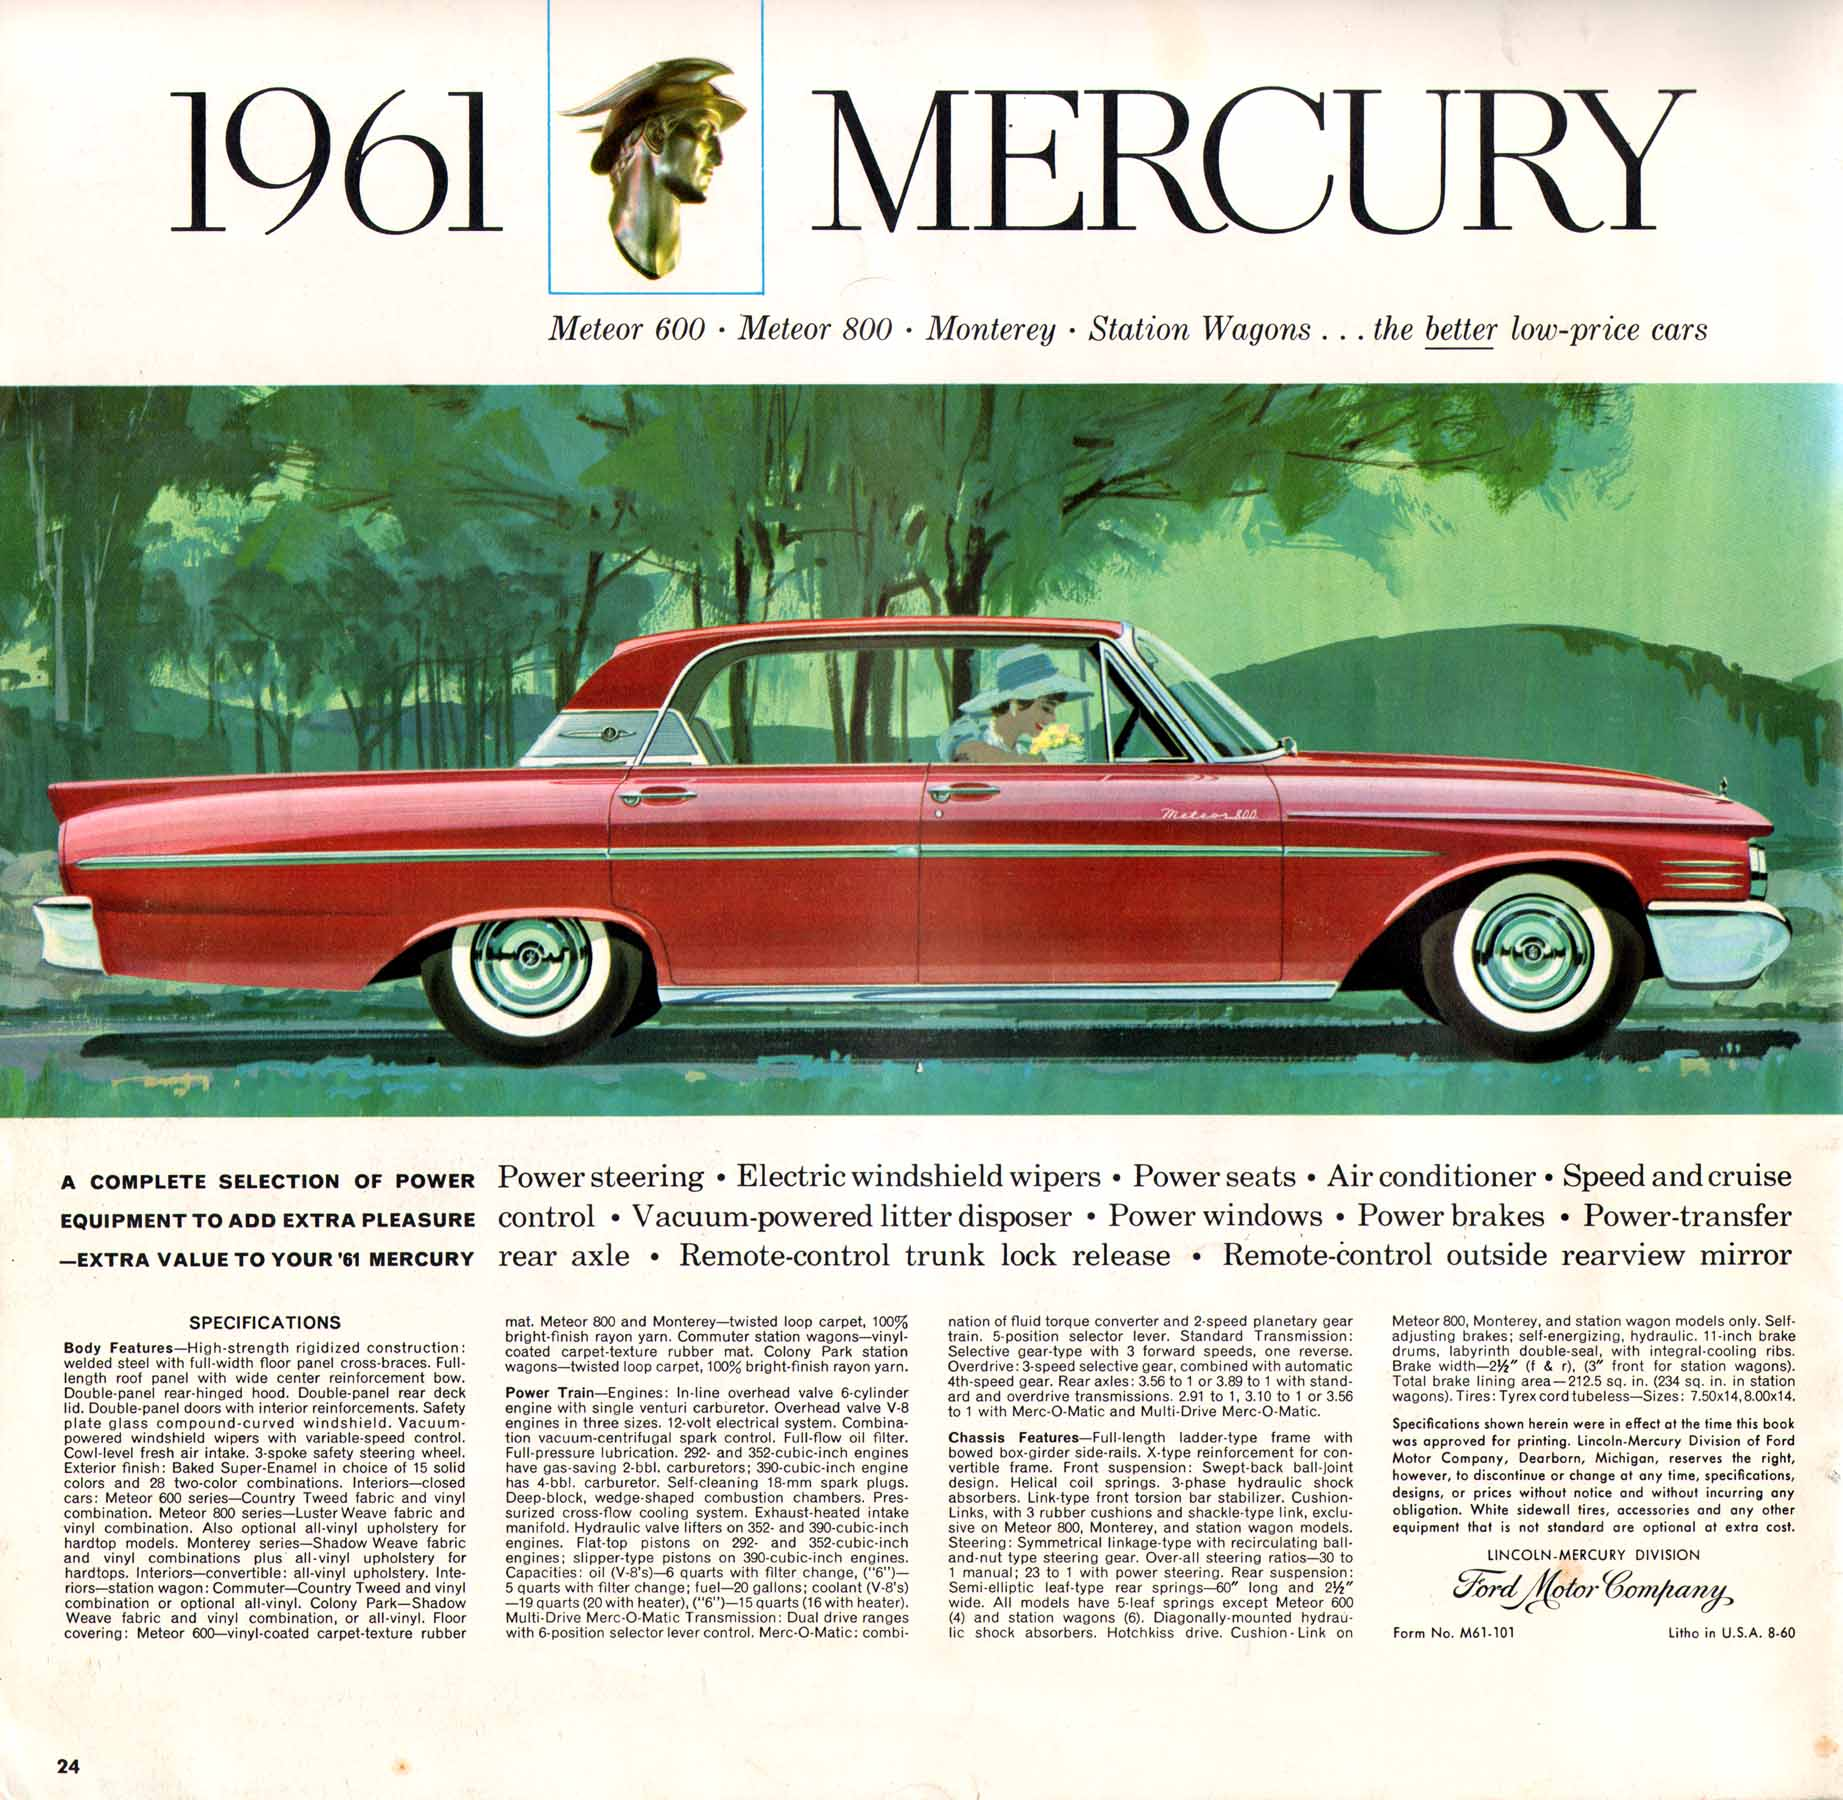 1961 Mercury Full Size-24